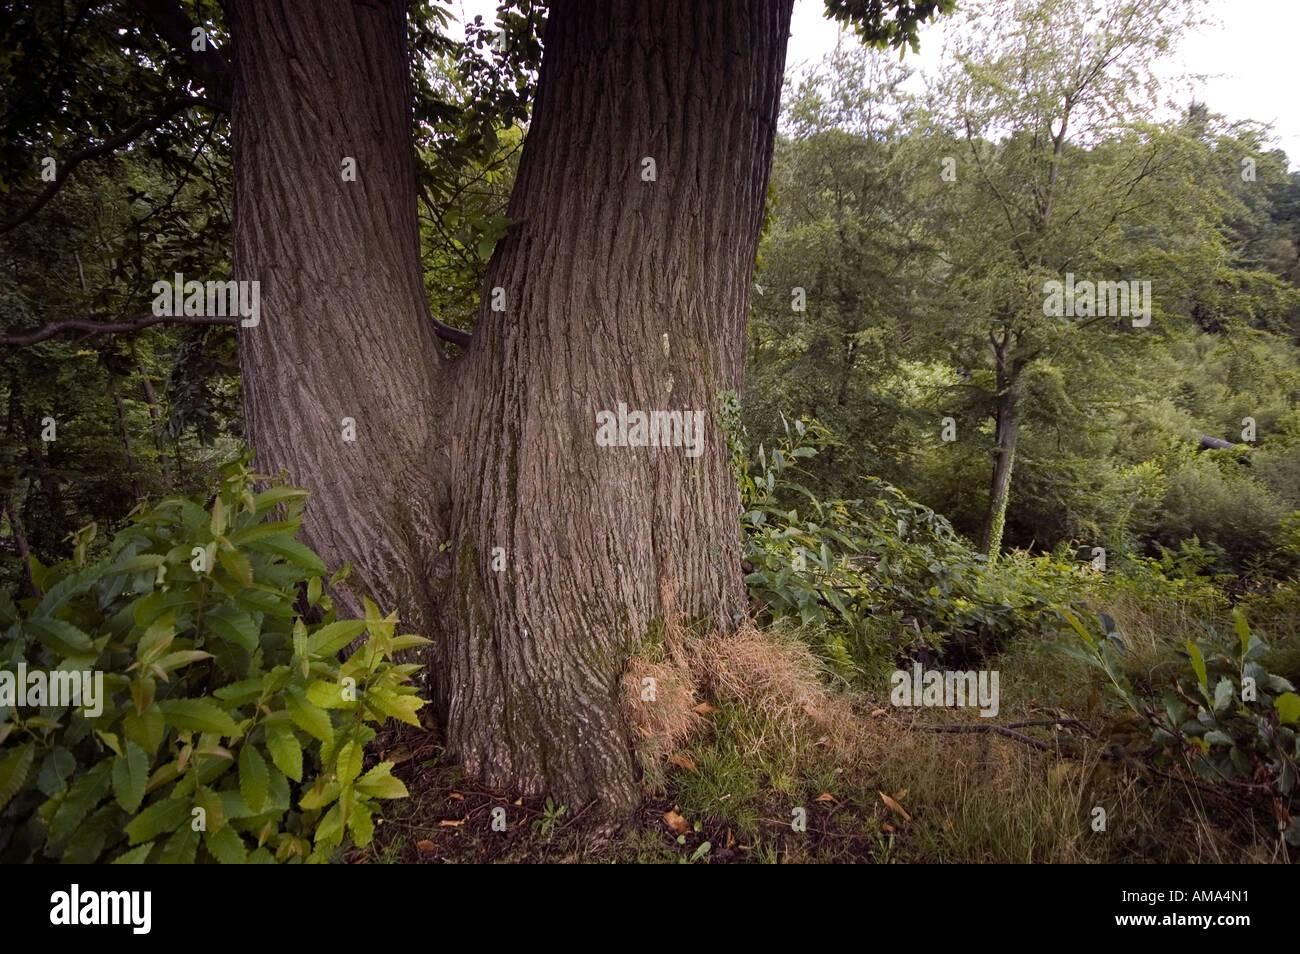 Double Tree Trunk - Stock Image